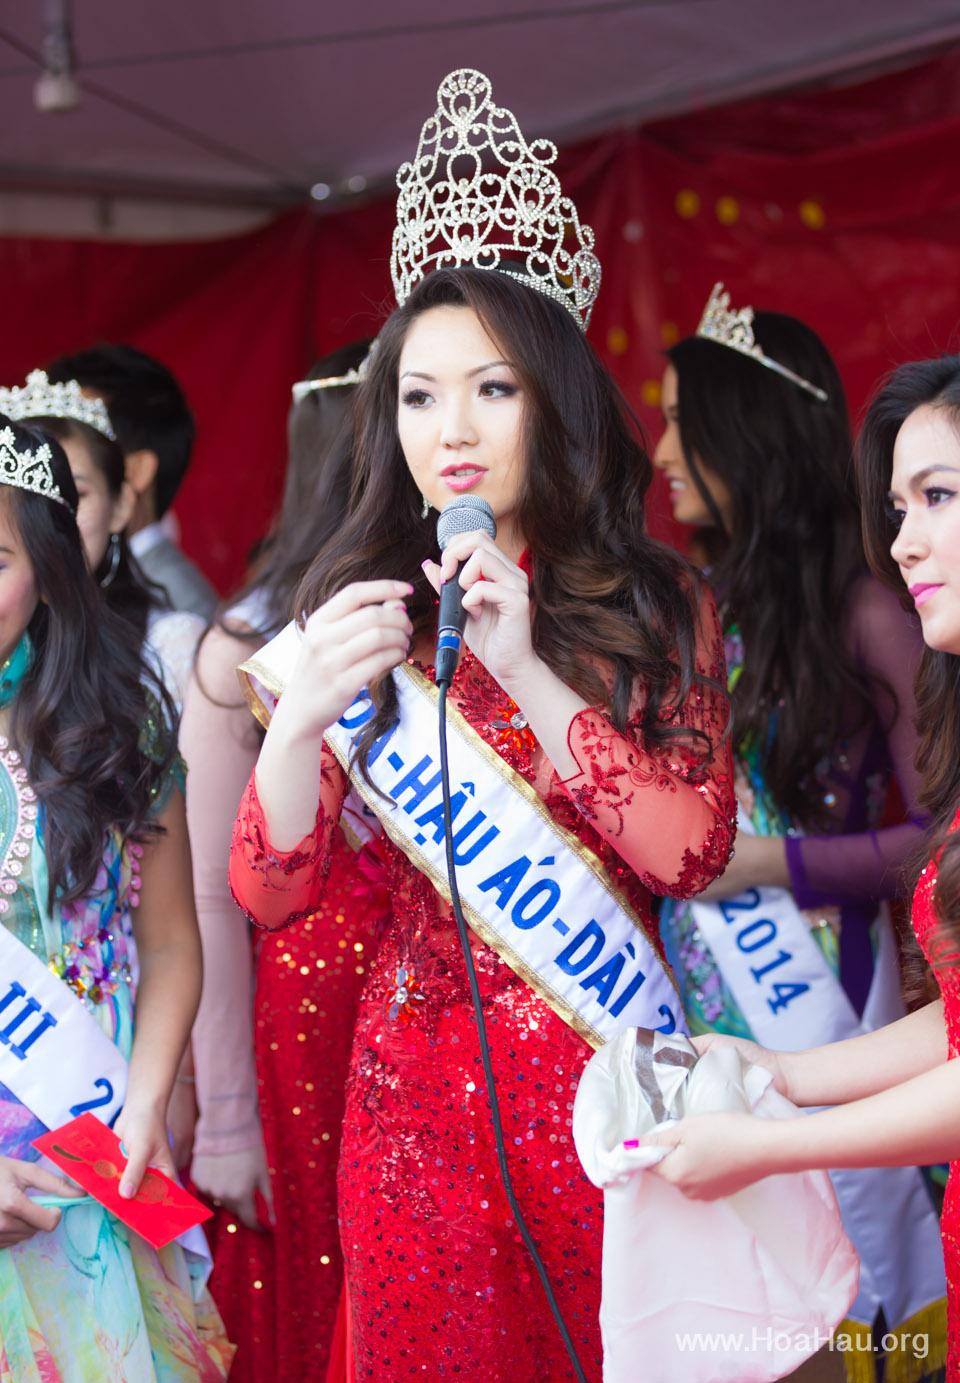 Tet Festival 2014 at Vietnam Town - Hoa Hau - Miss Vietnam - Image 218